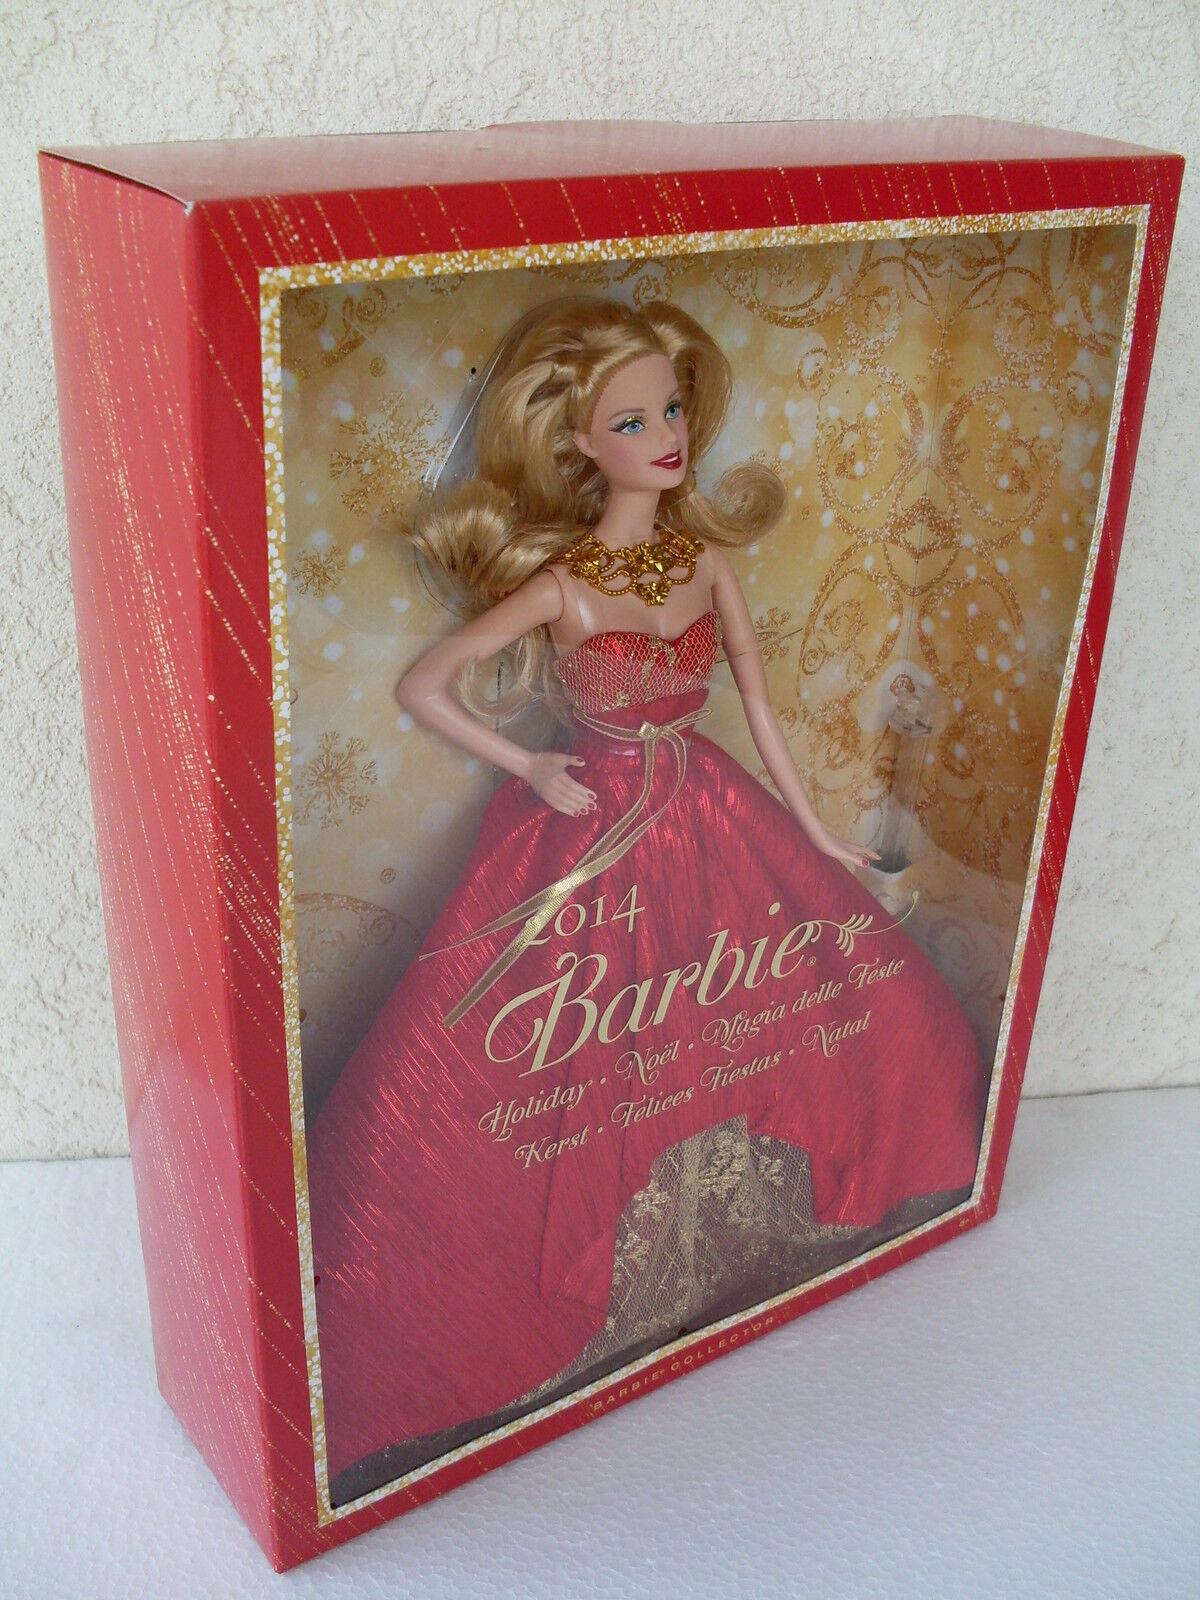 Barbie holiday magia delle feste 2014 natale christmas noel collector NRFB BDH13